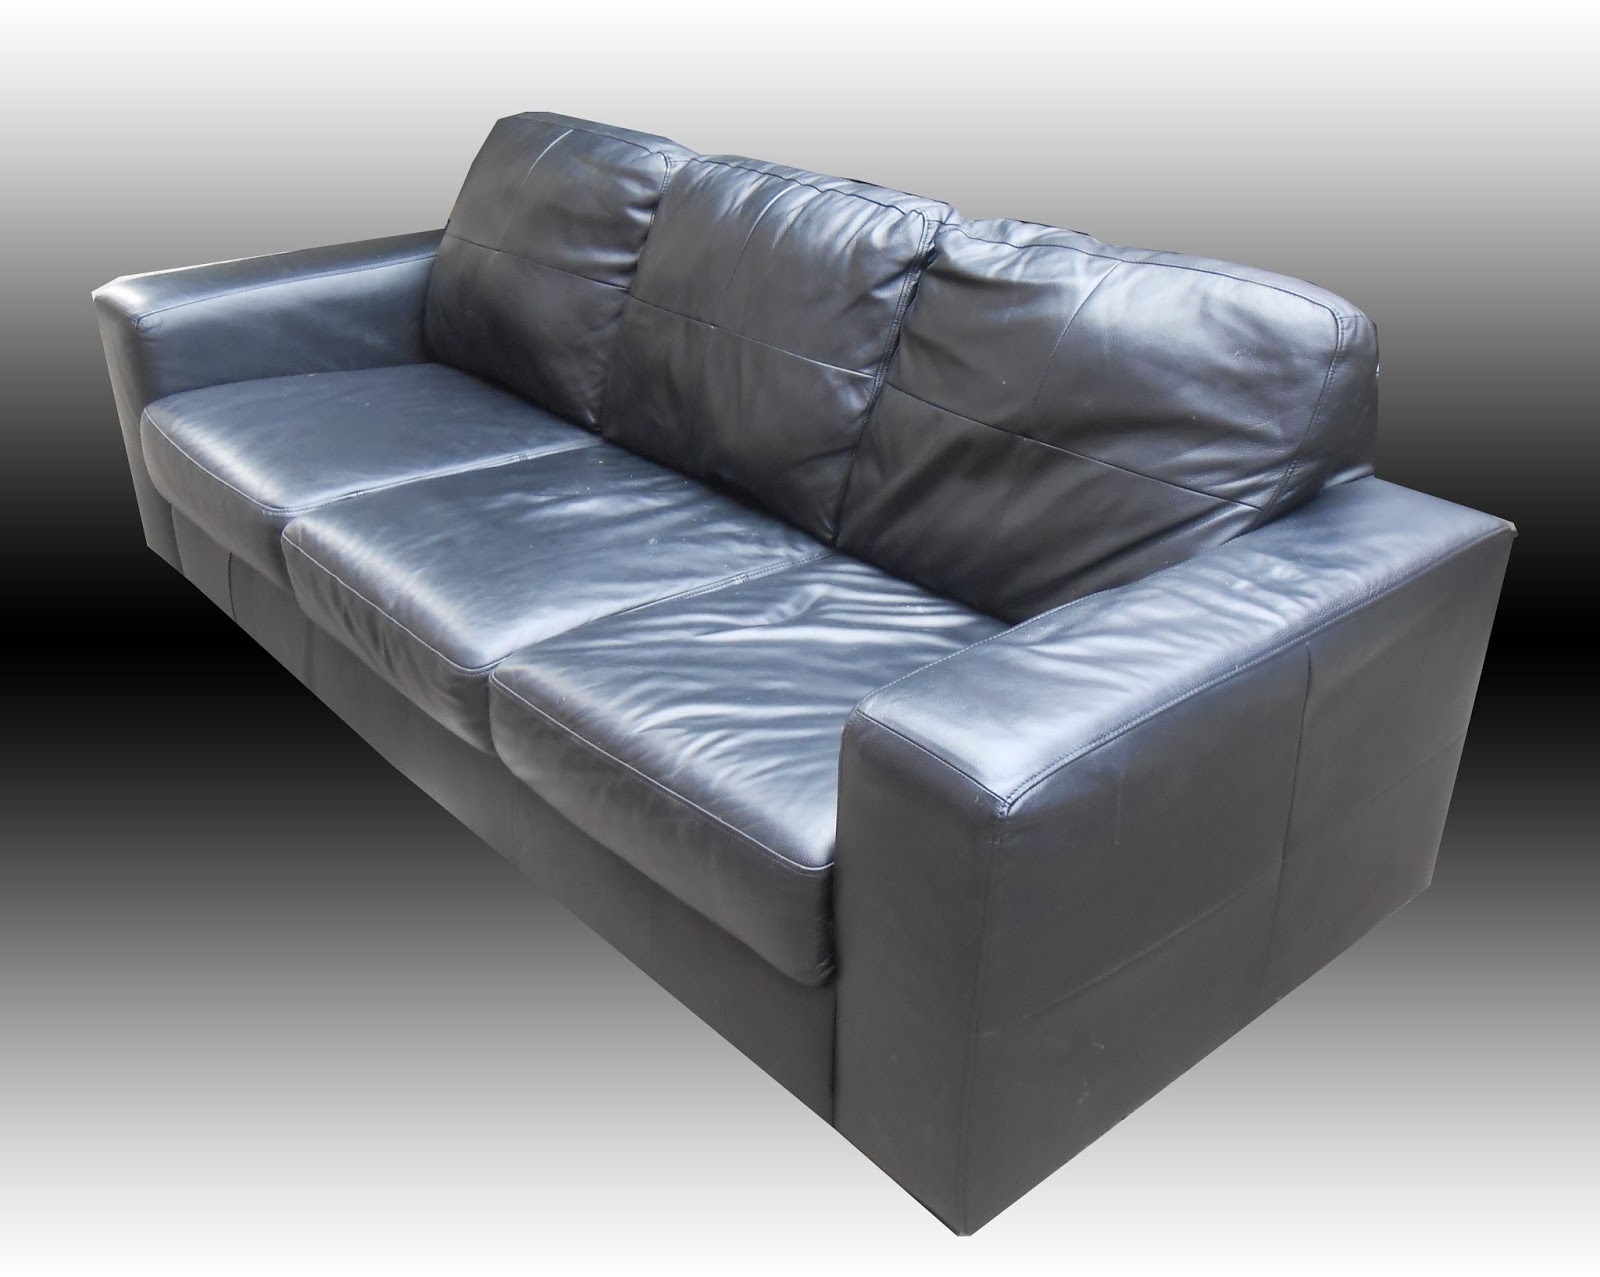 Uhuru Furniture  Collectibles IKEA Black Leather Sofa SOLD